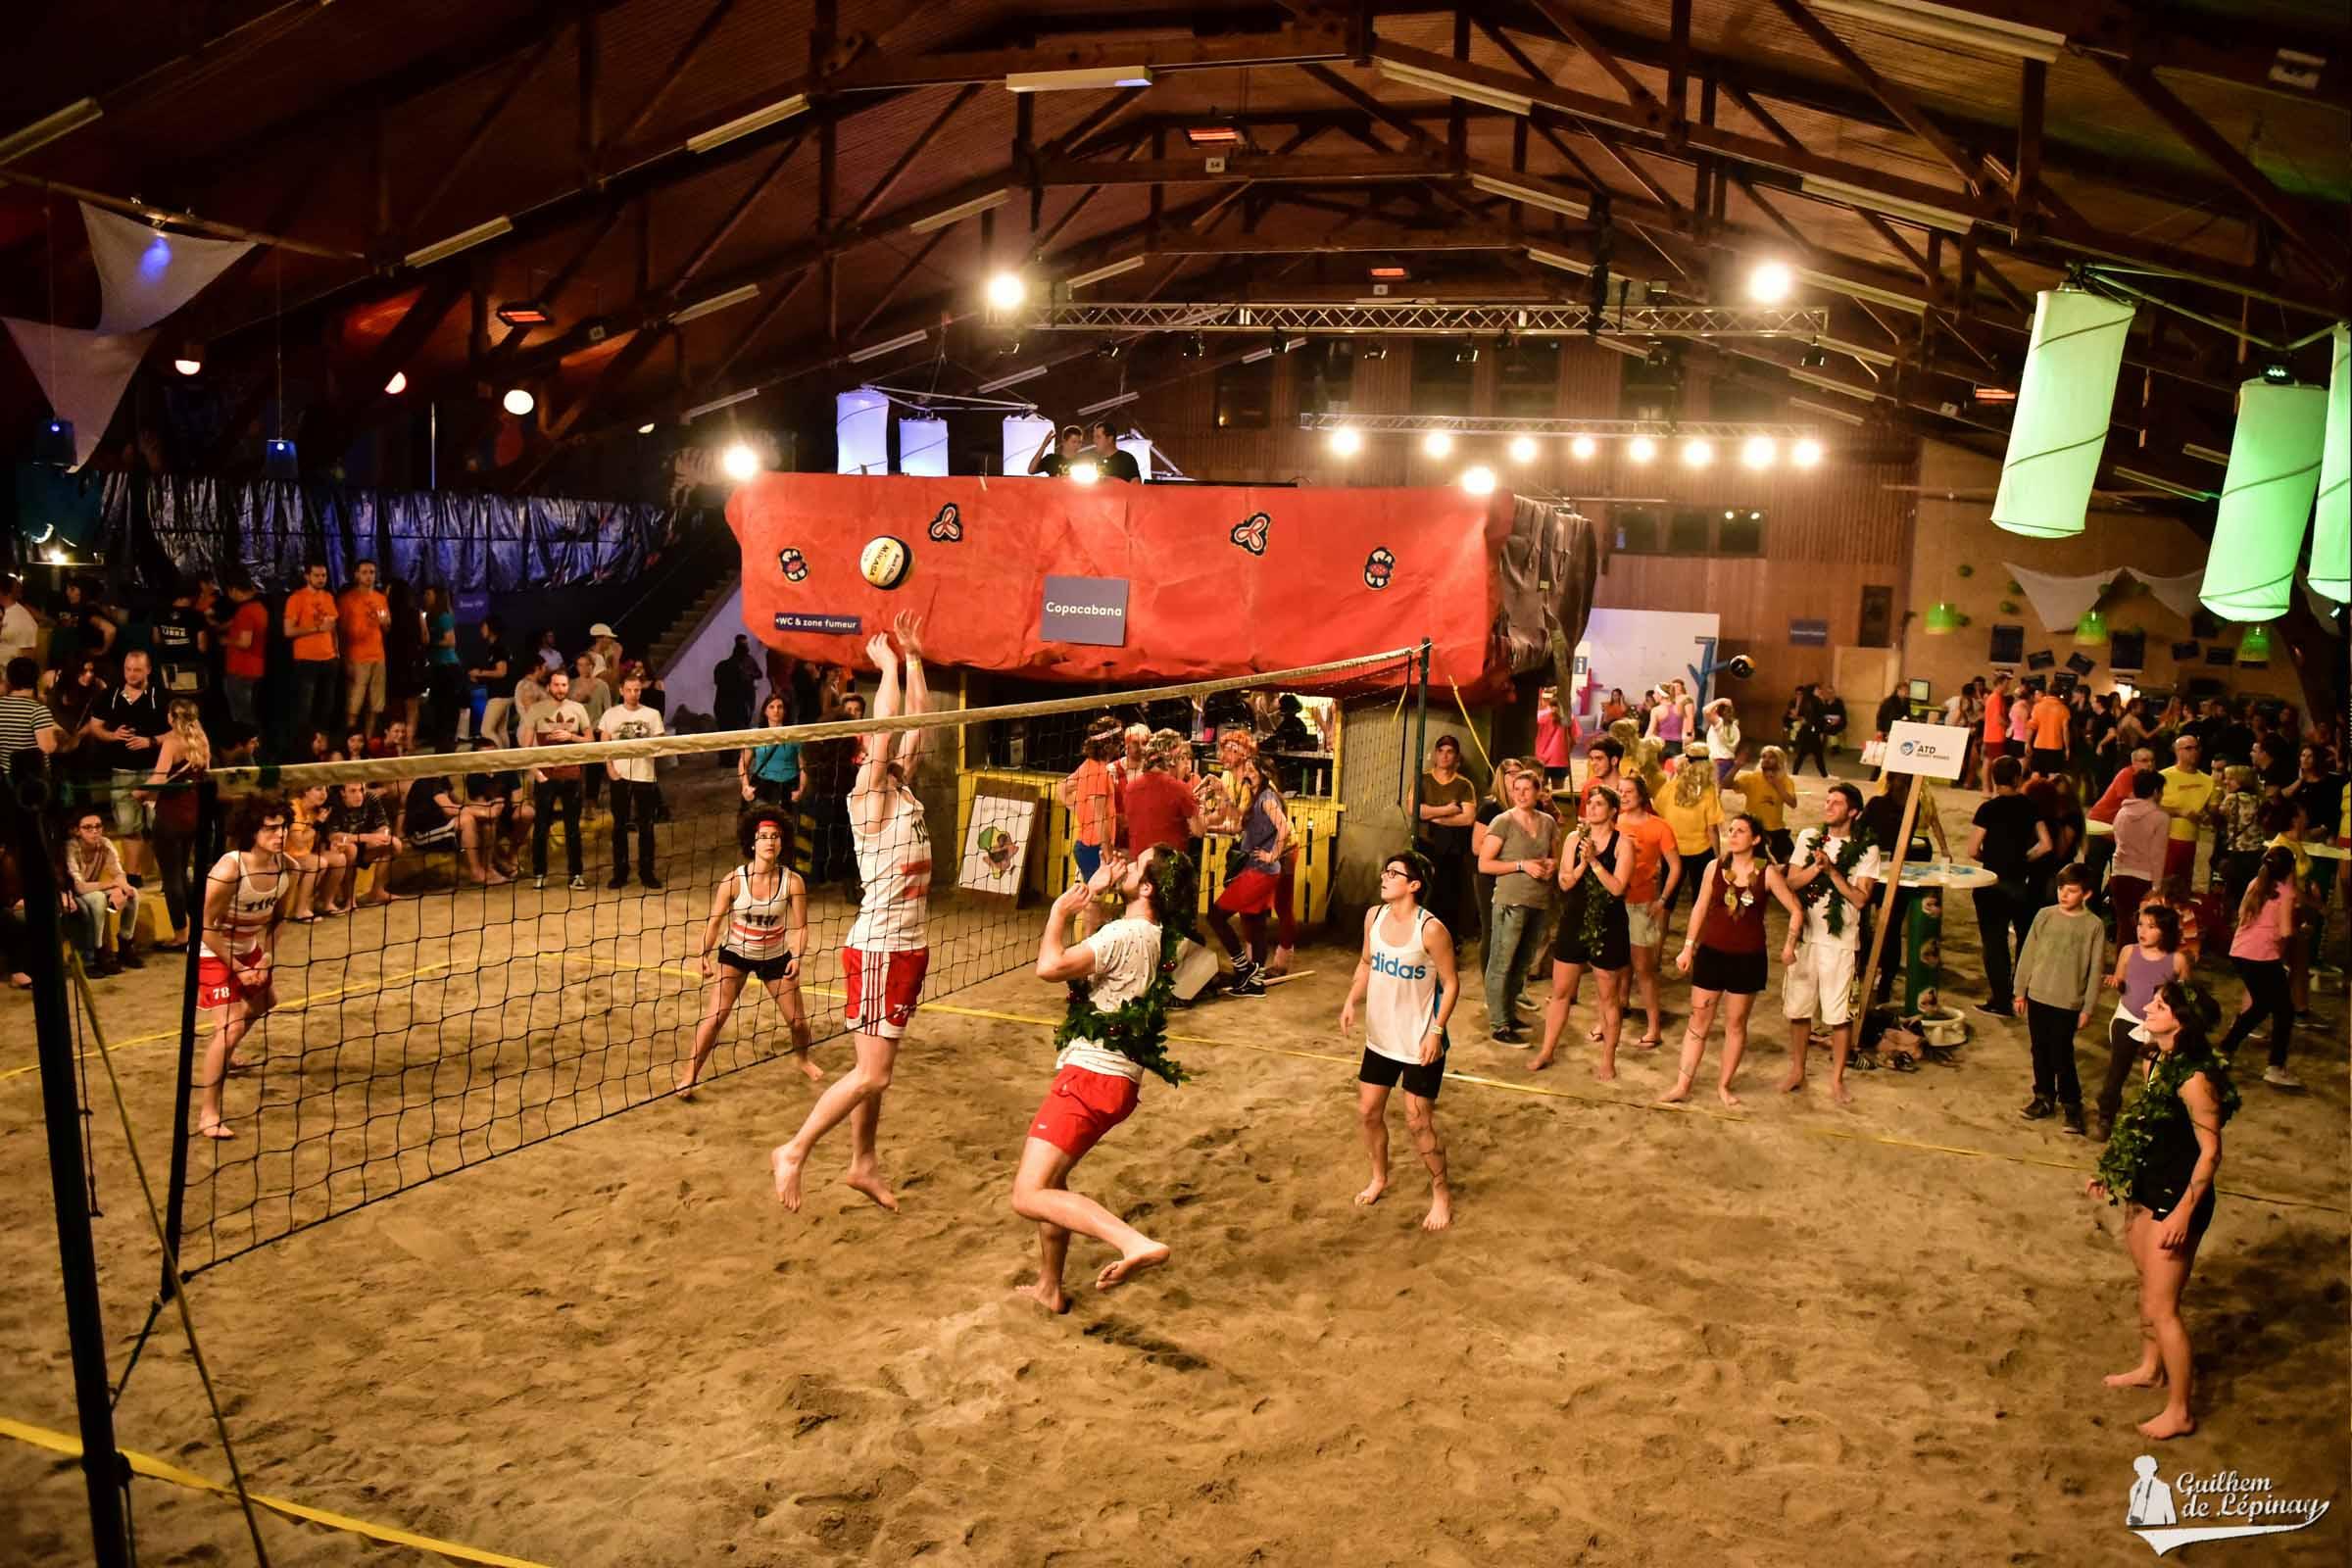 Tropicana-beach-contest-bassecourt-101